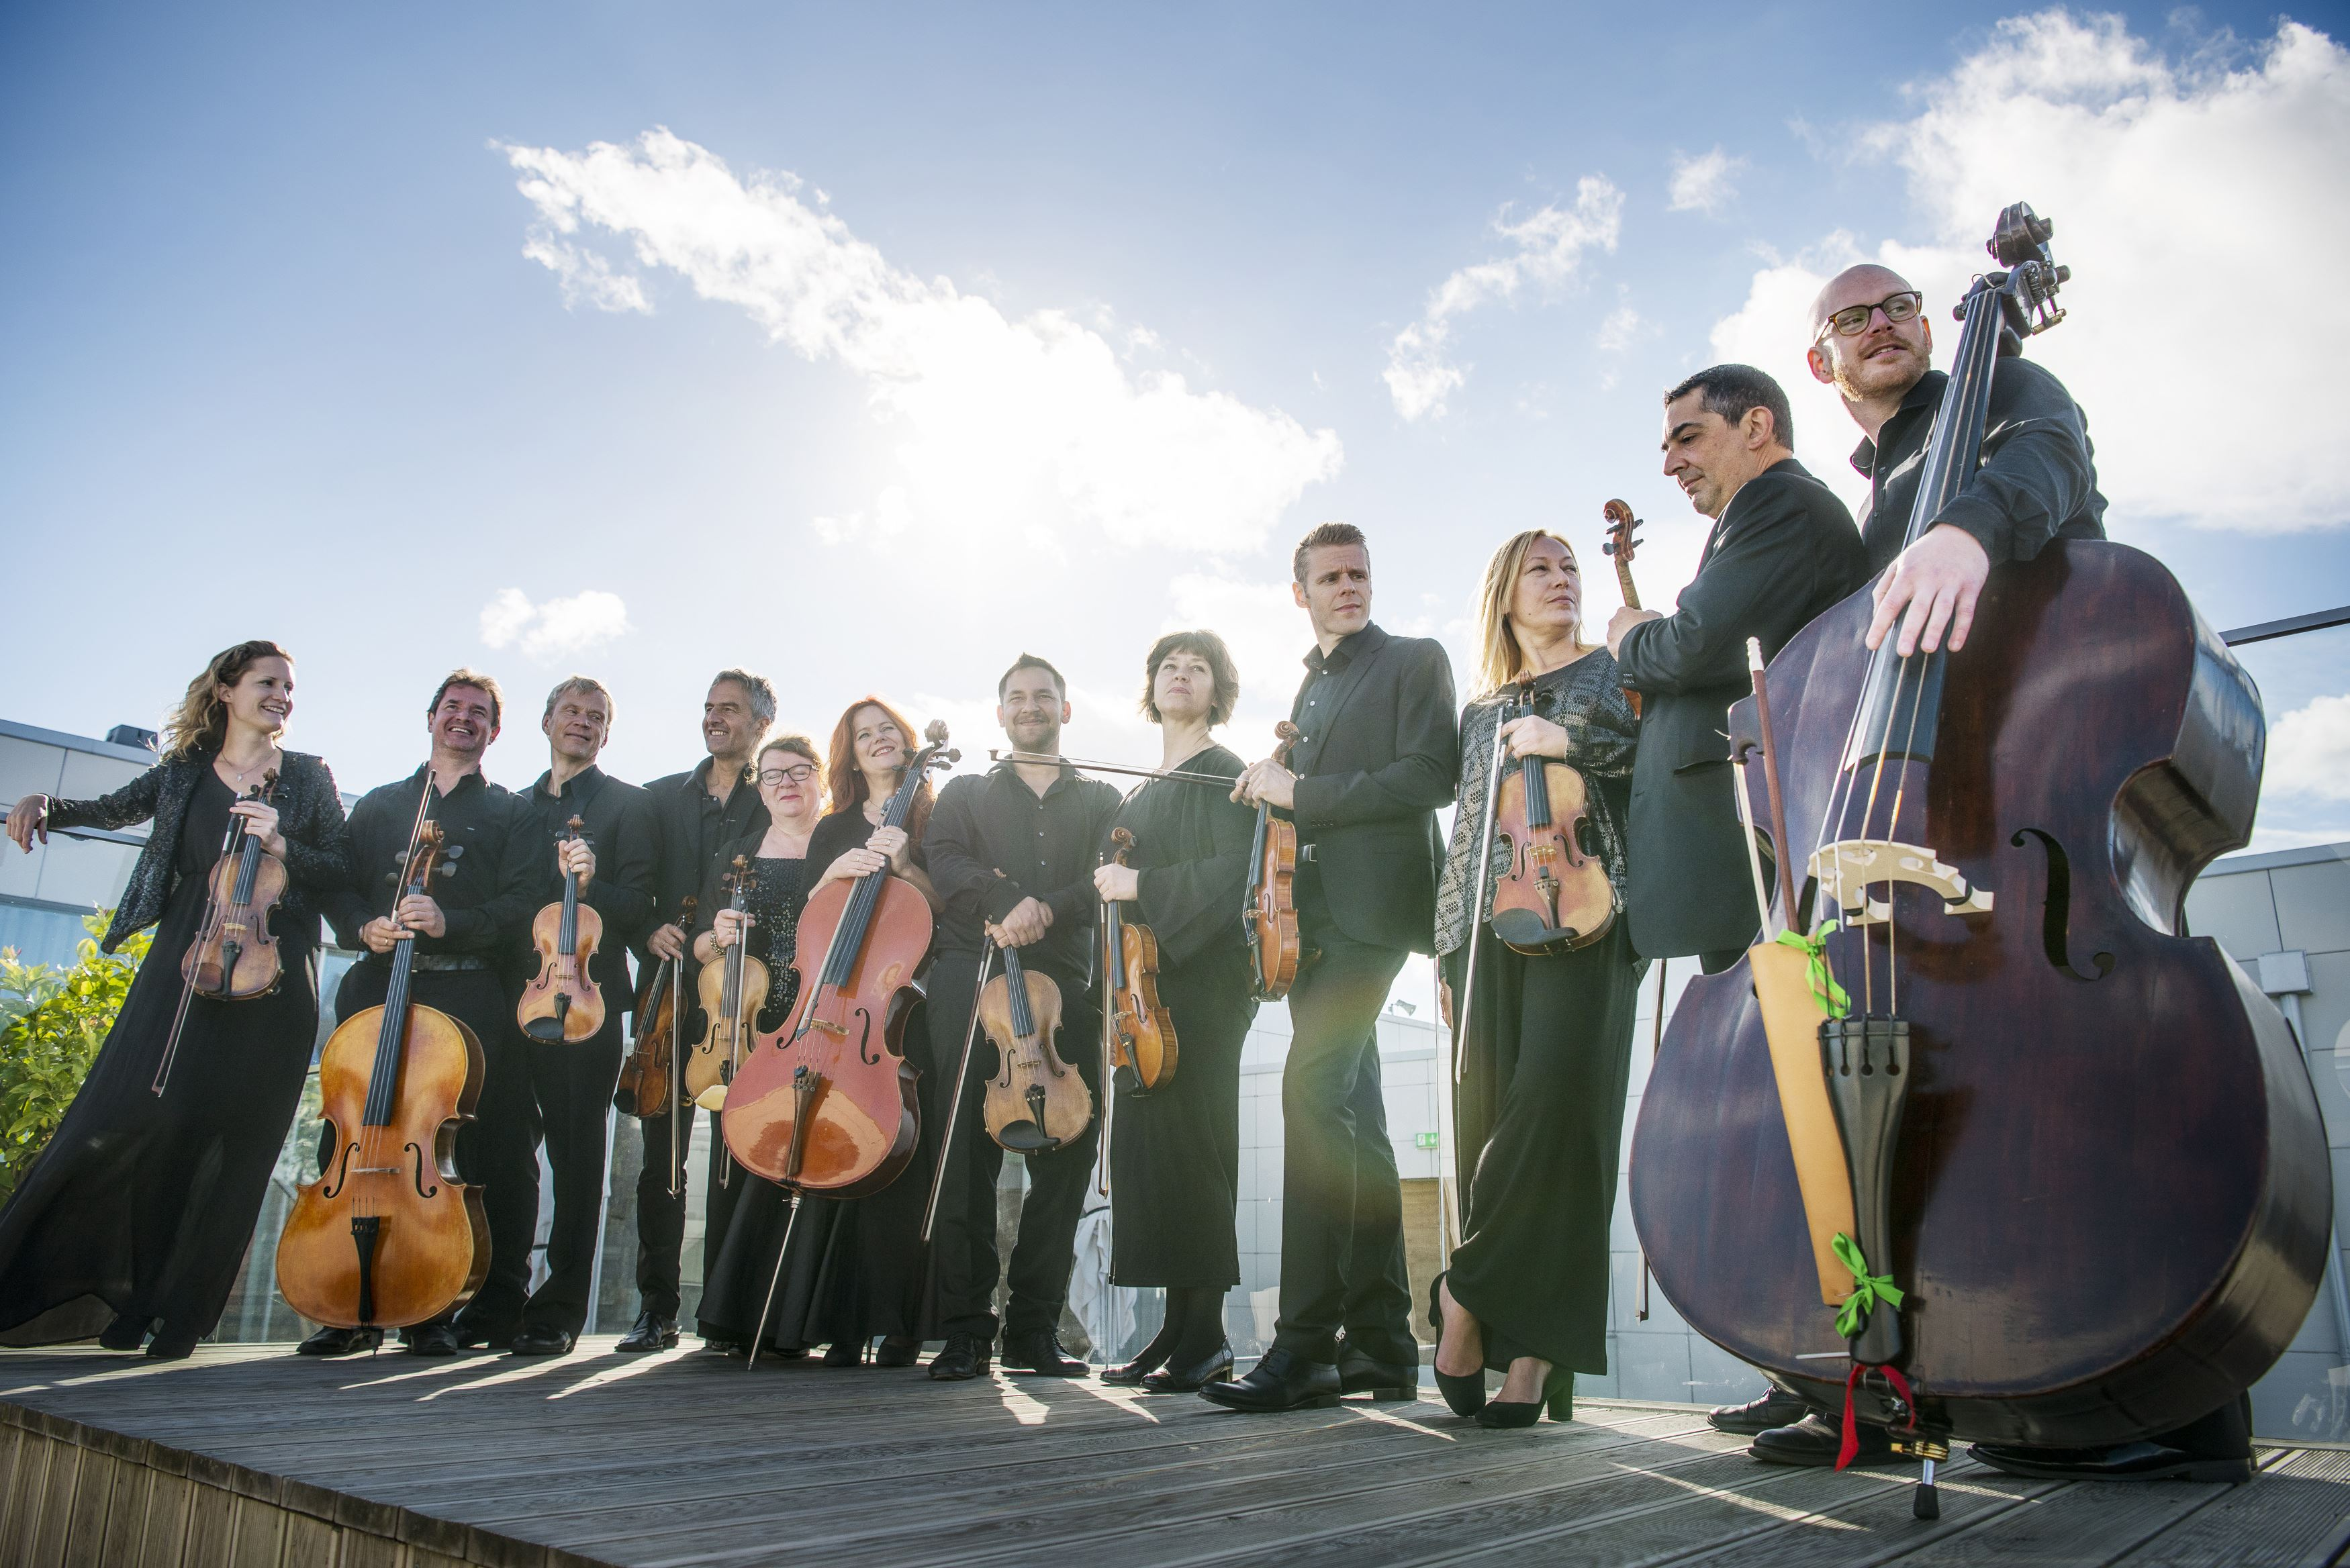 Scensommar: Musica Vitae - Intåg i sommarhagen